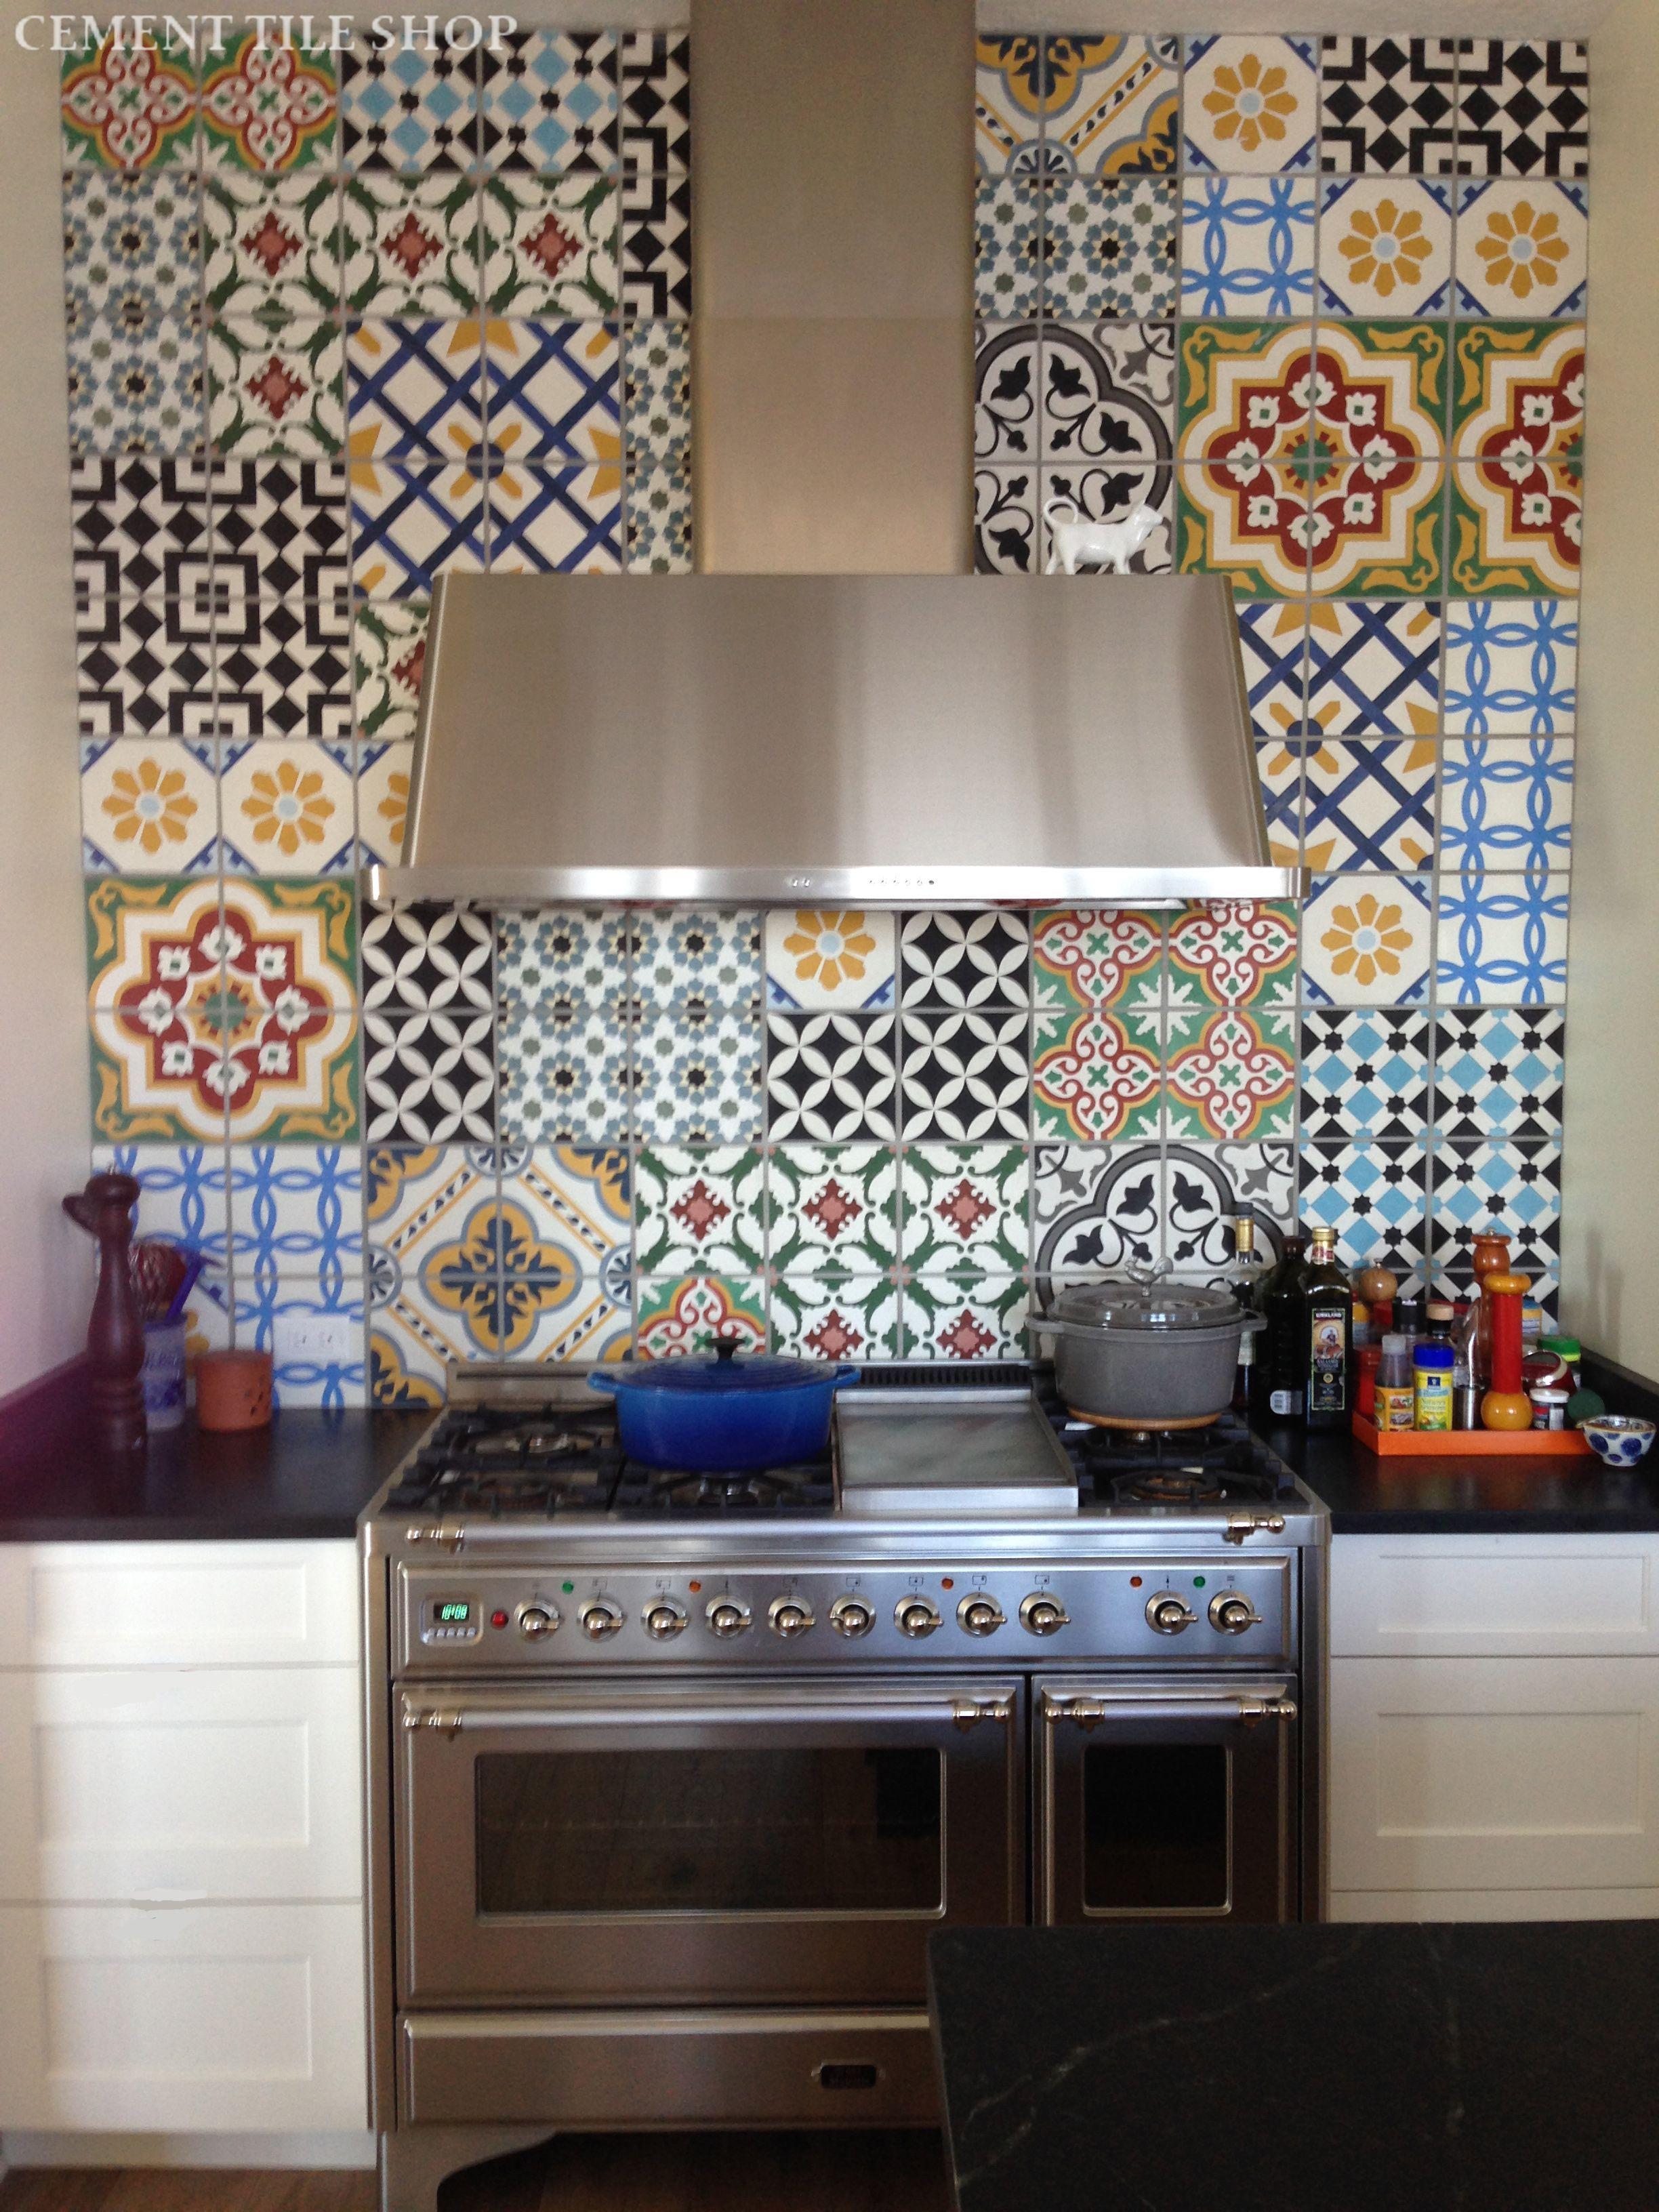 Cement Tile Shop Handmade Cement Tile Patchwork Pattern We